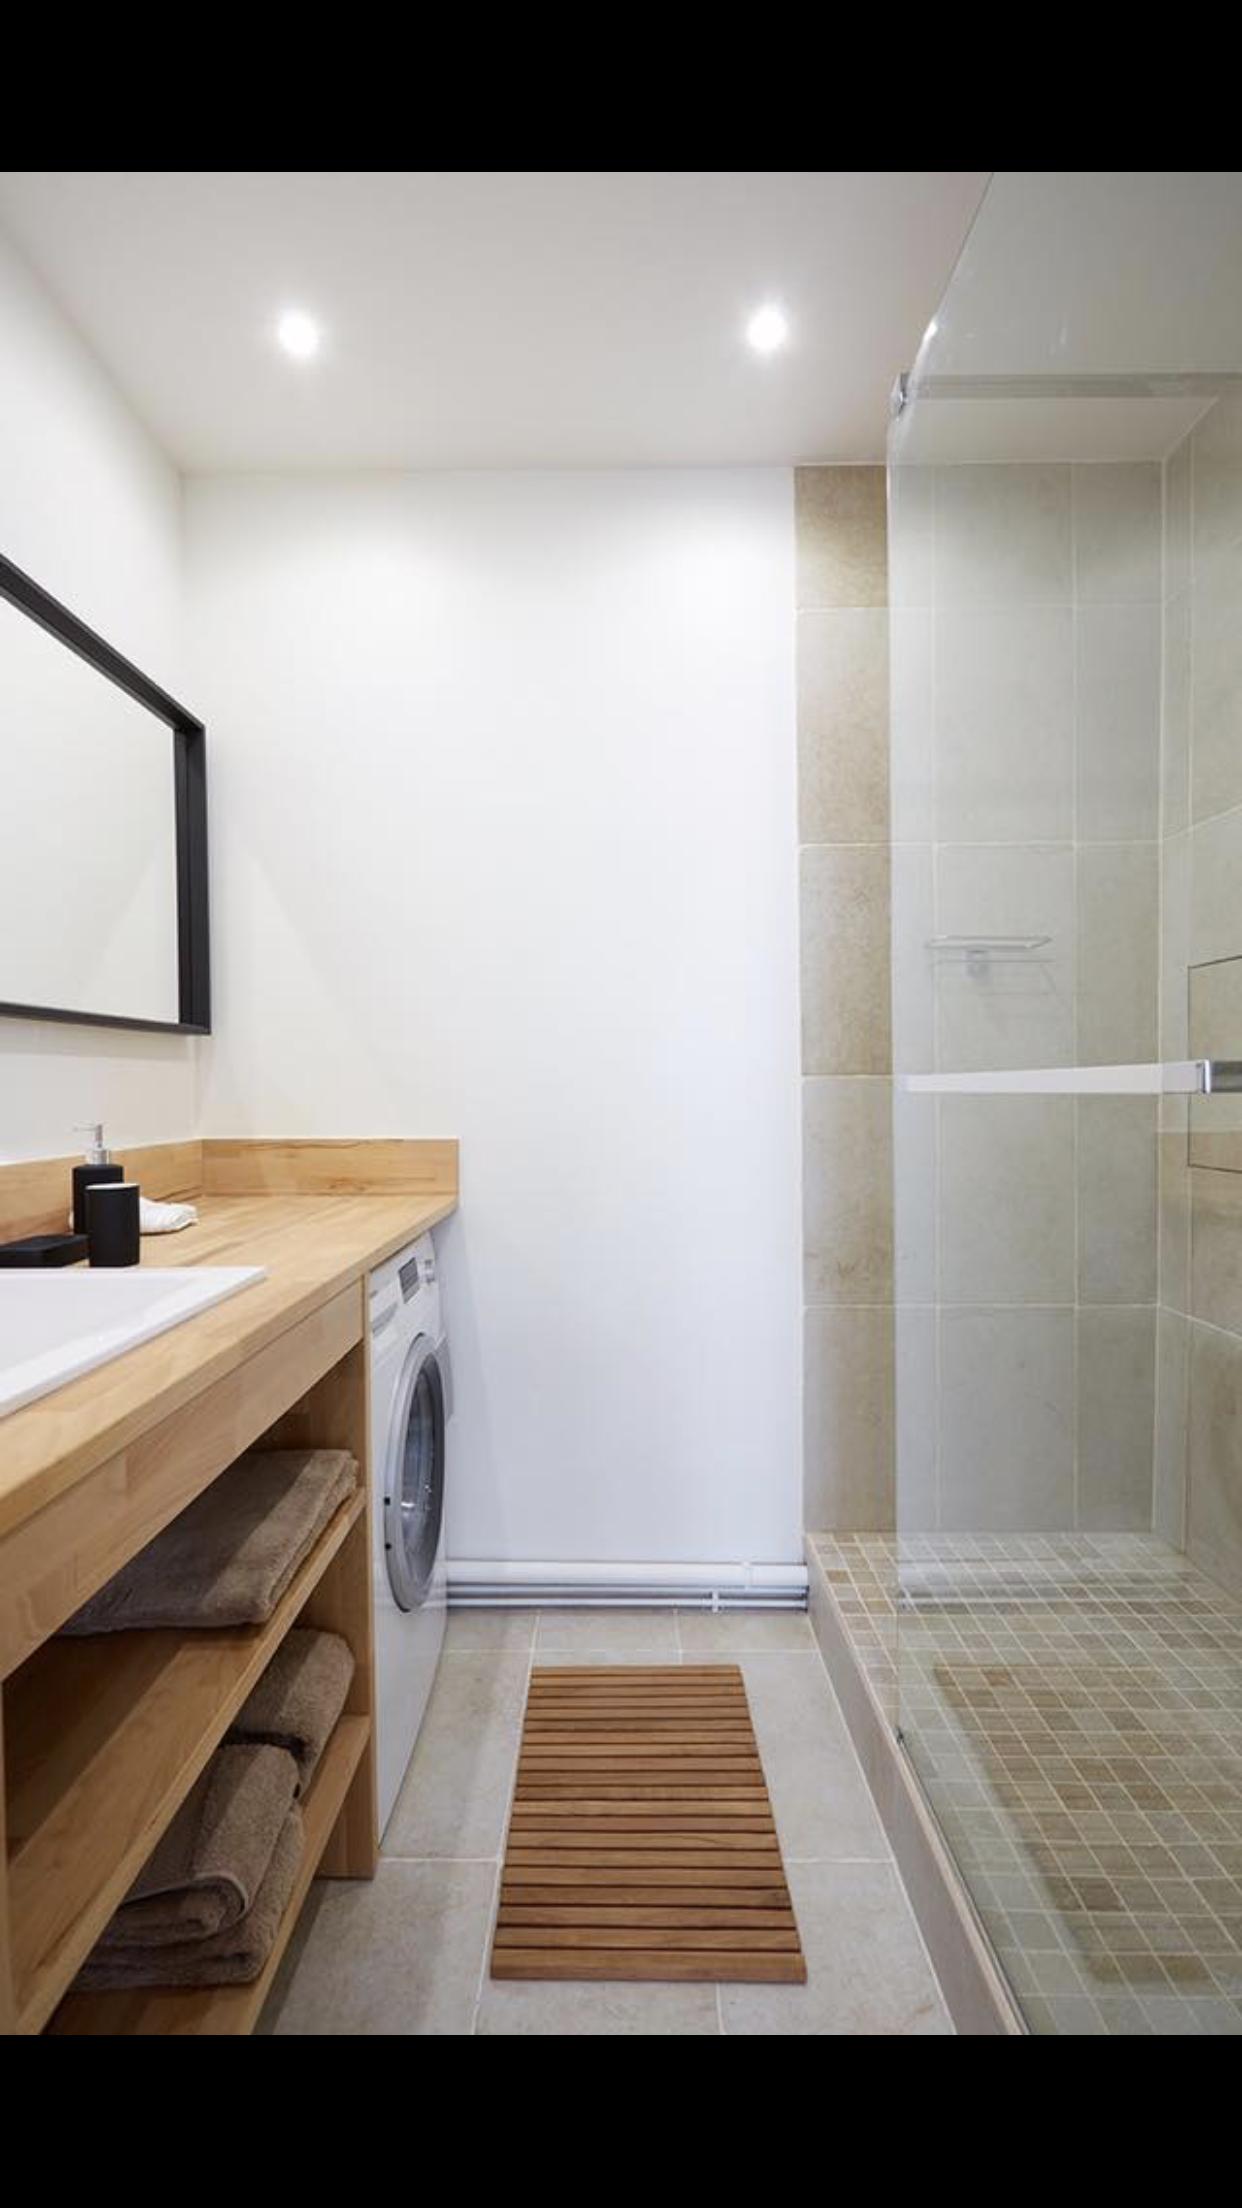 Salle De Bain Agrandir ~ r alisation gares conception salle de bain style scandinave machine